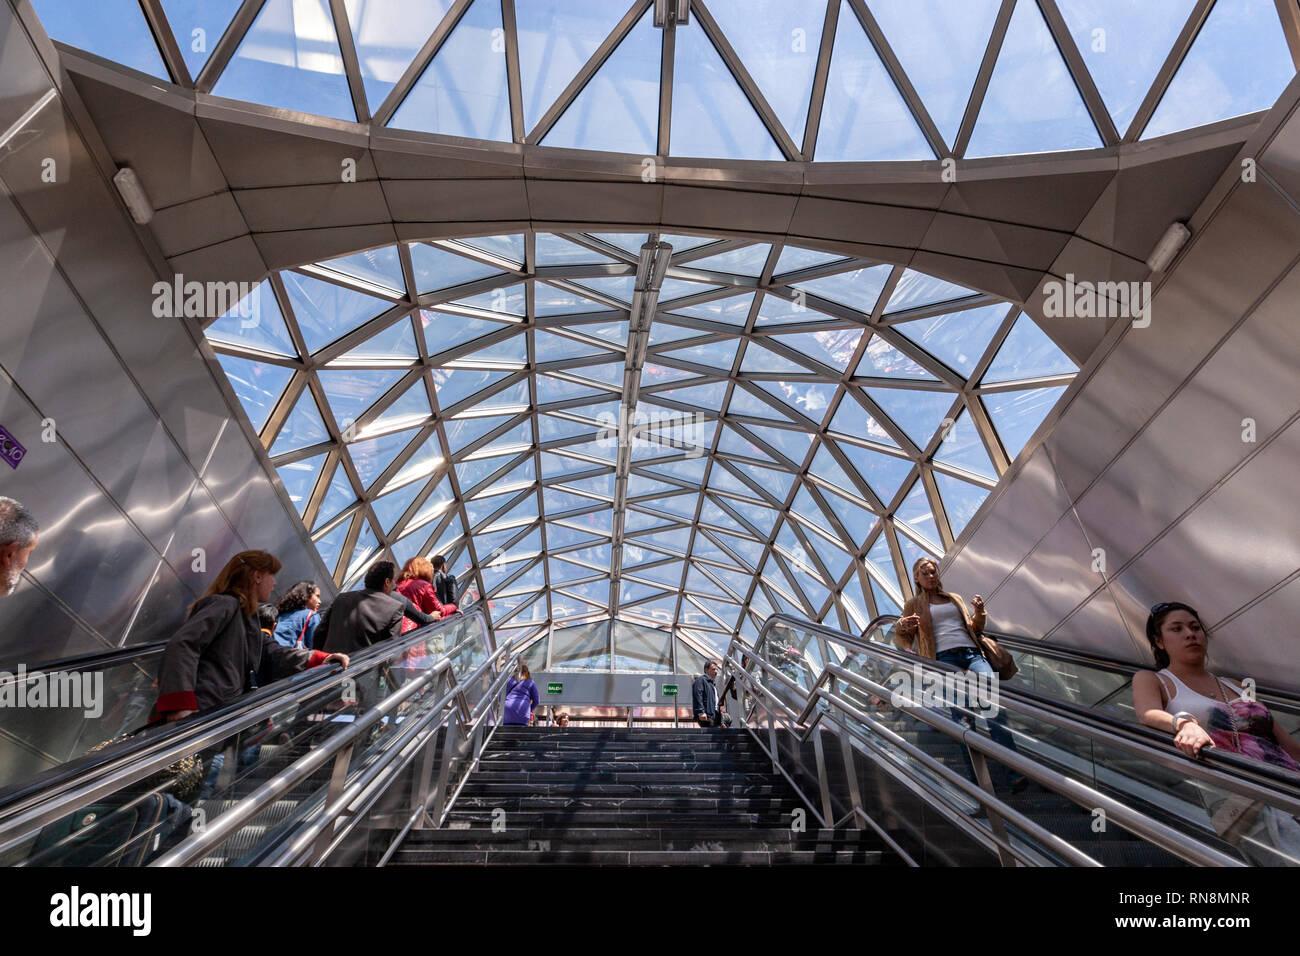 Travellers down via escalators in the modern Metro Sol entrance, Puerta del Sol, Madrid, Spain Stock Photo